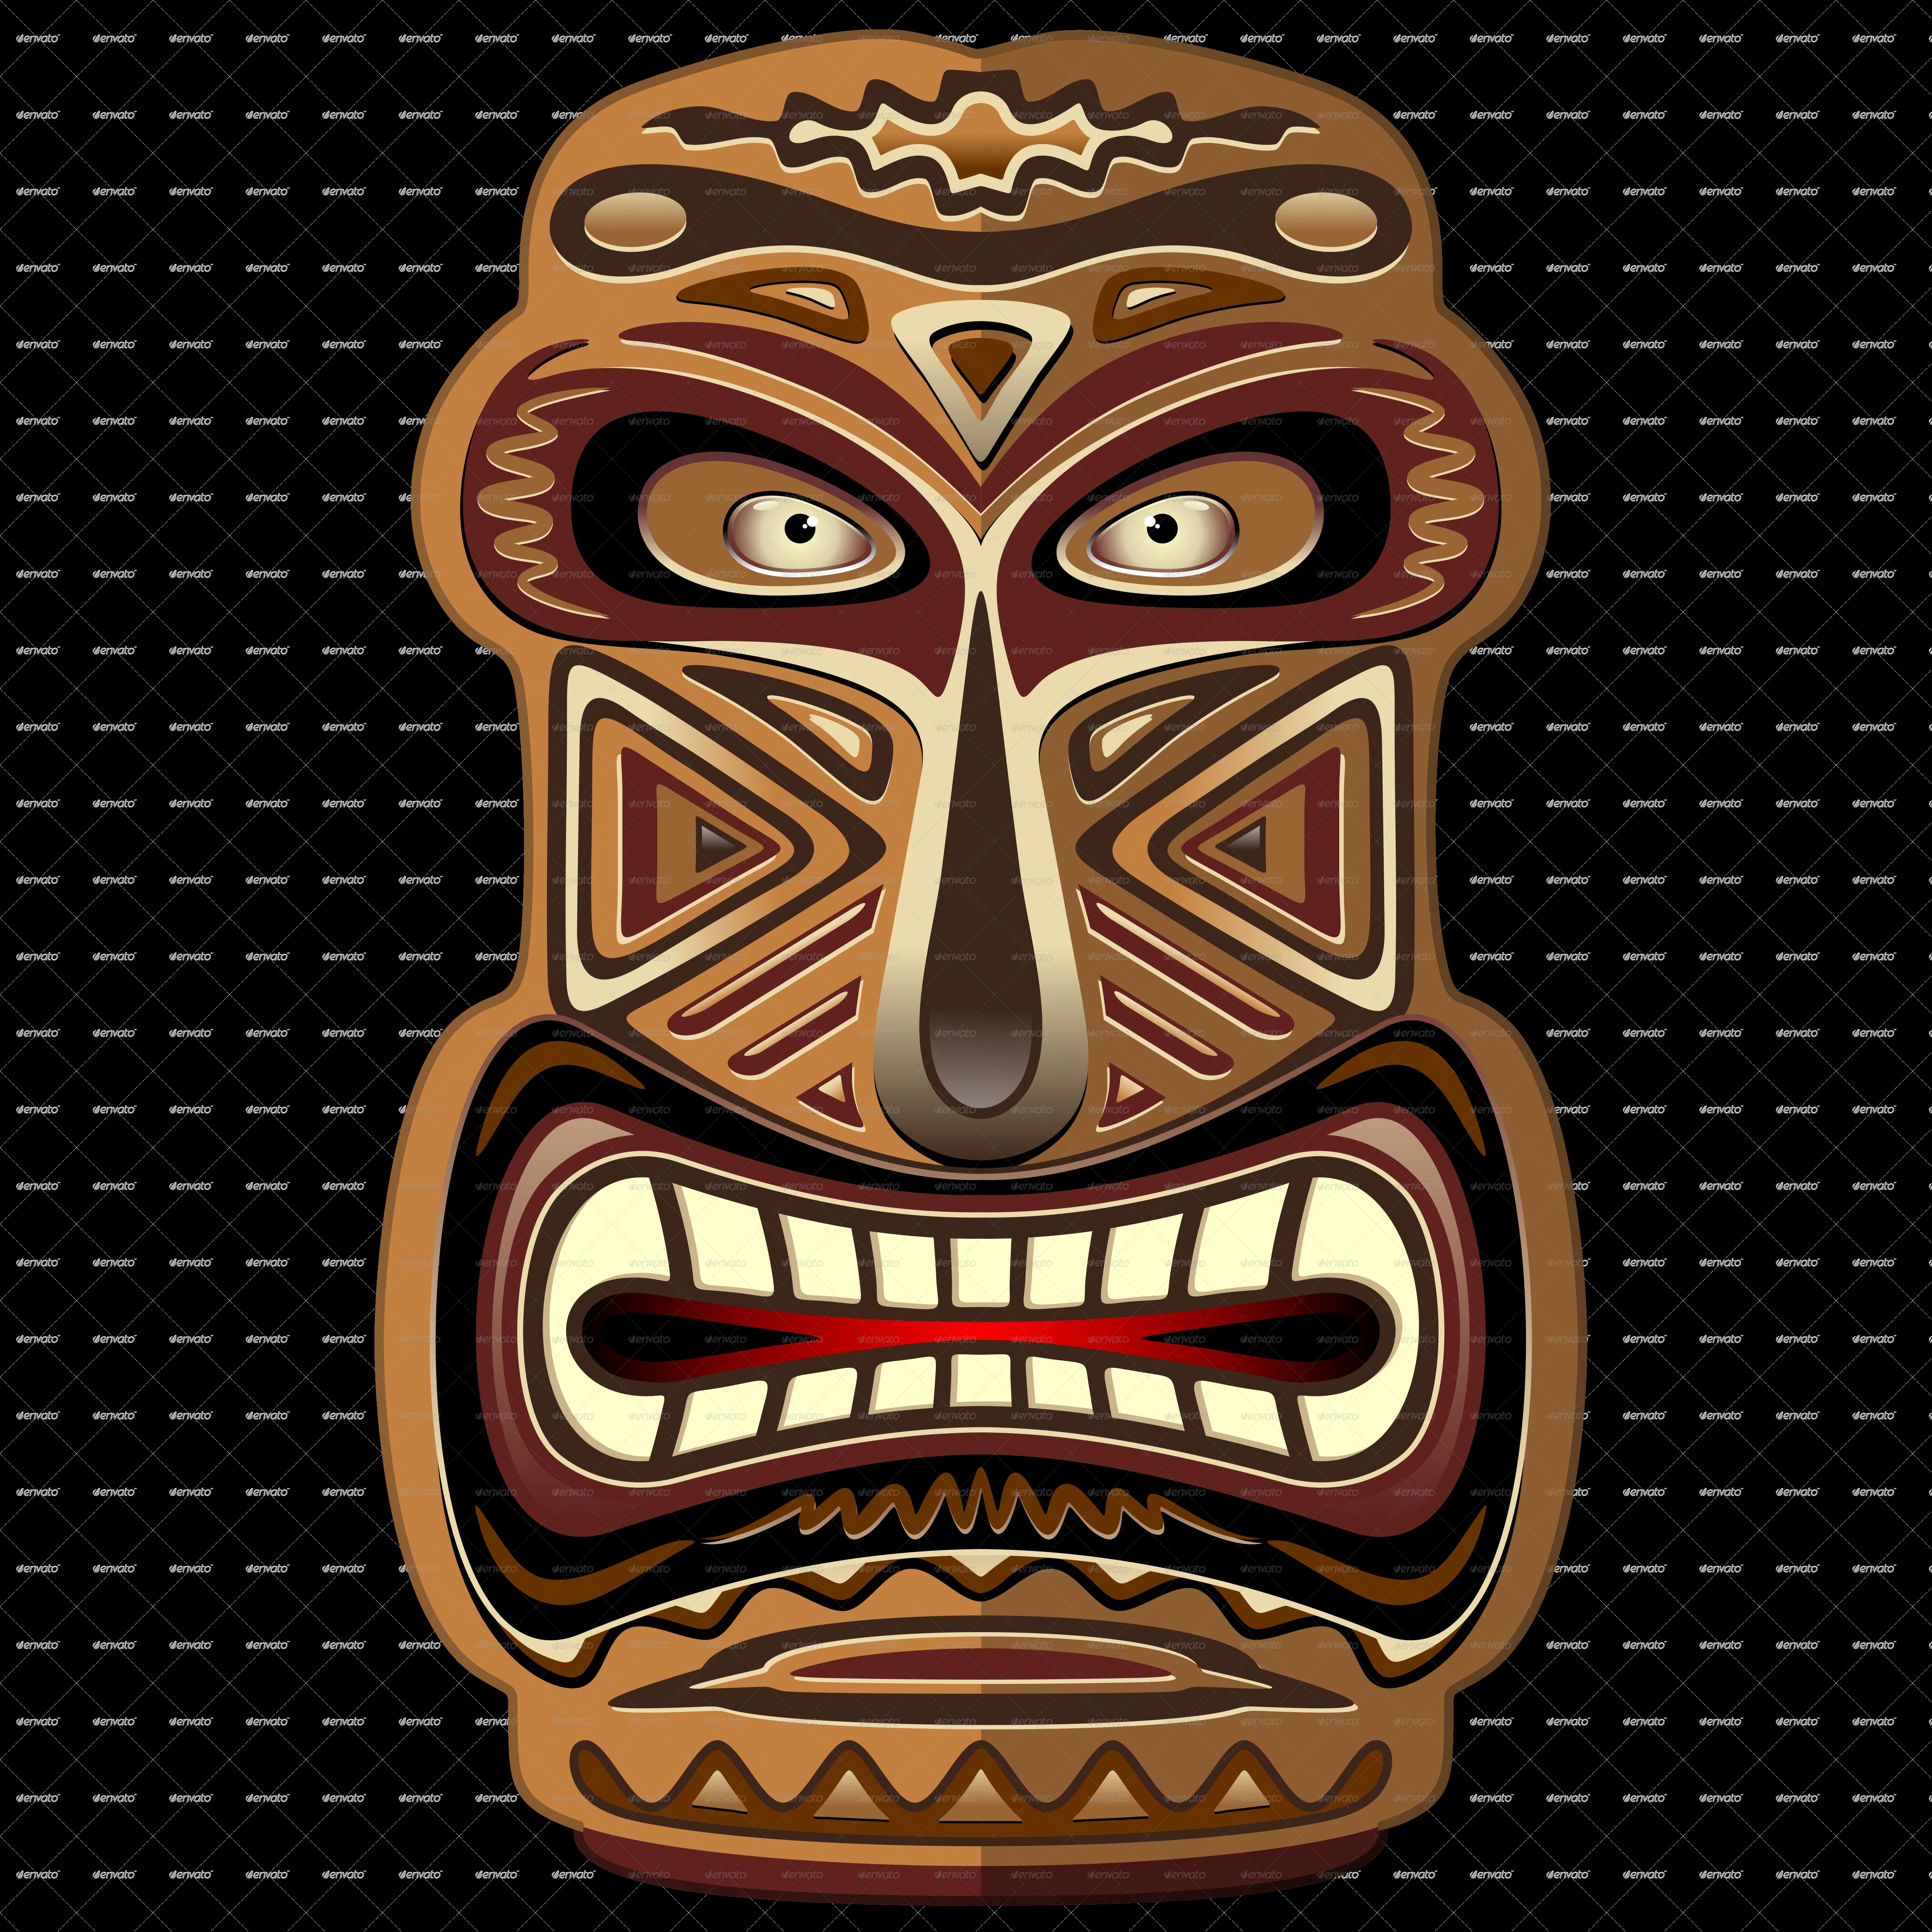 Hawaiian clipart totem pole. Pin by nadia munaro